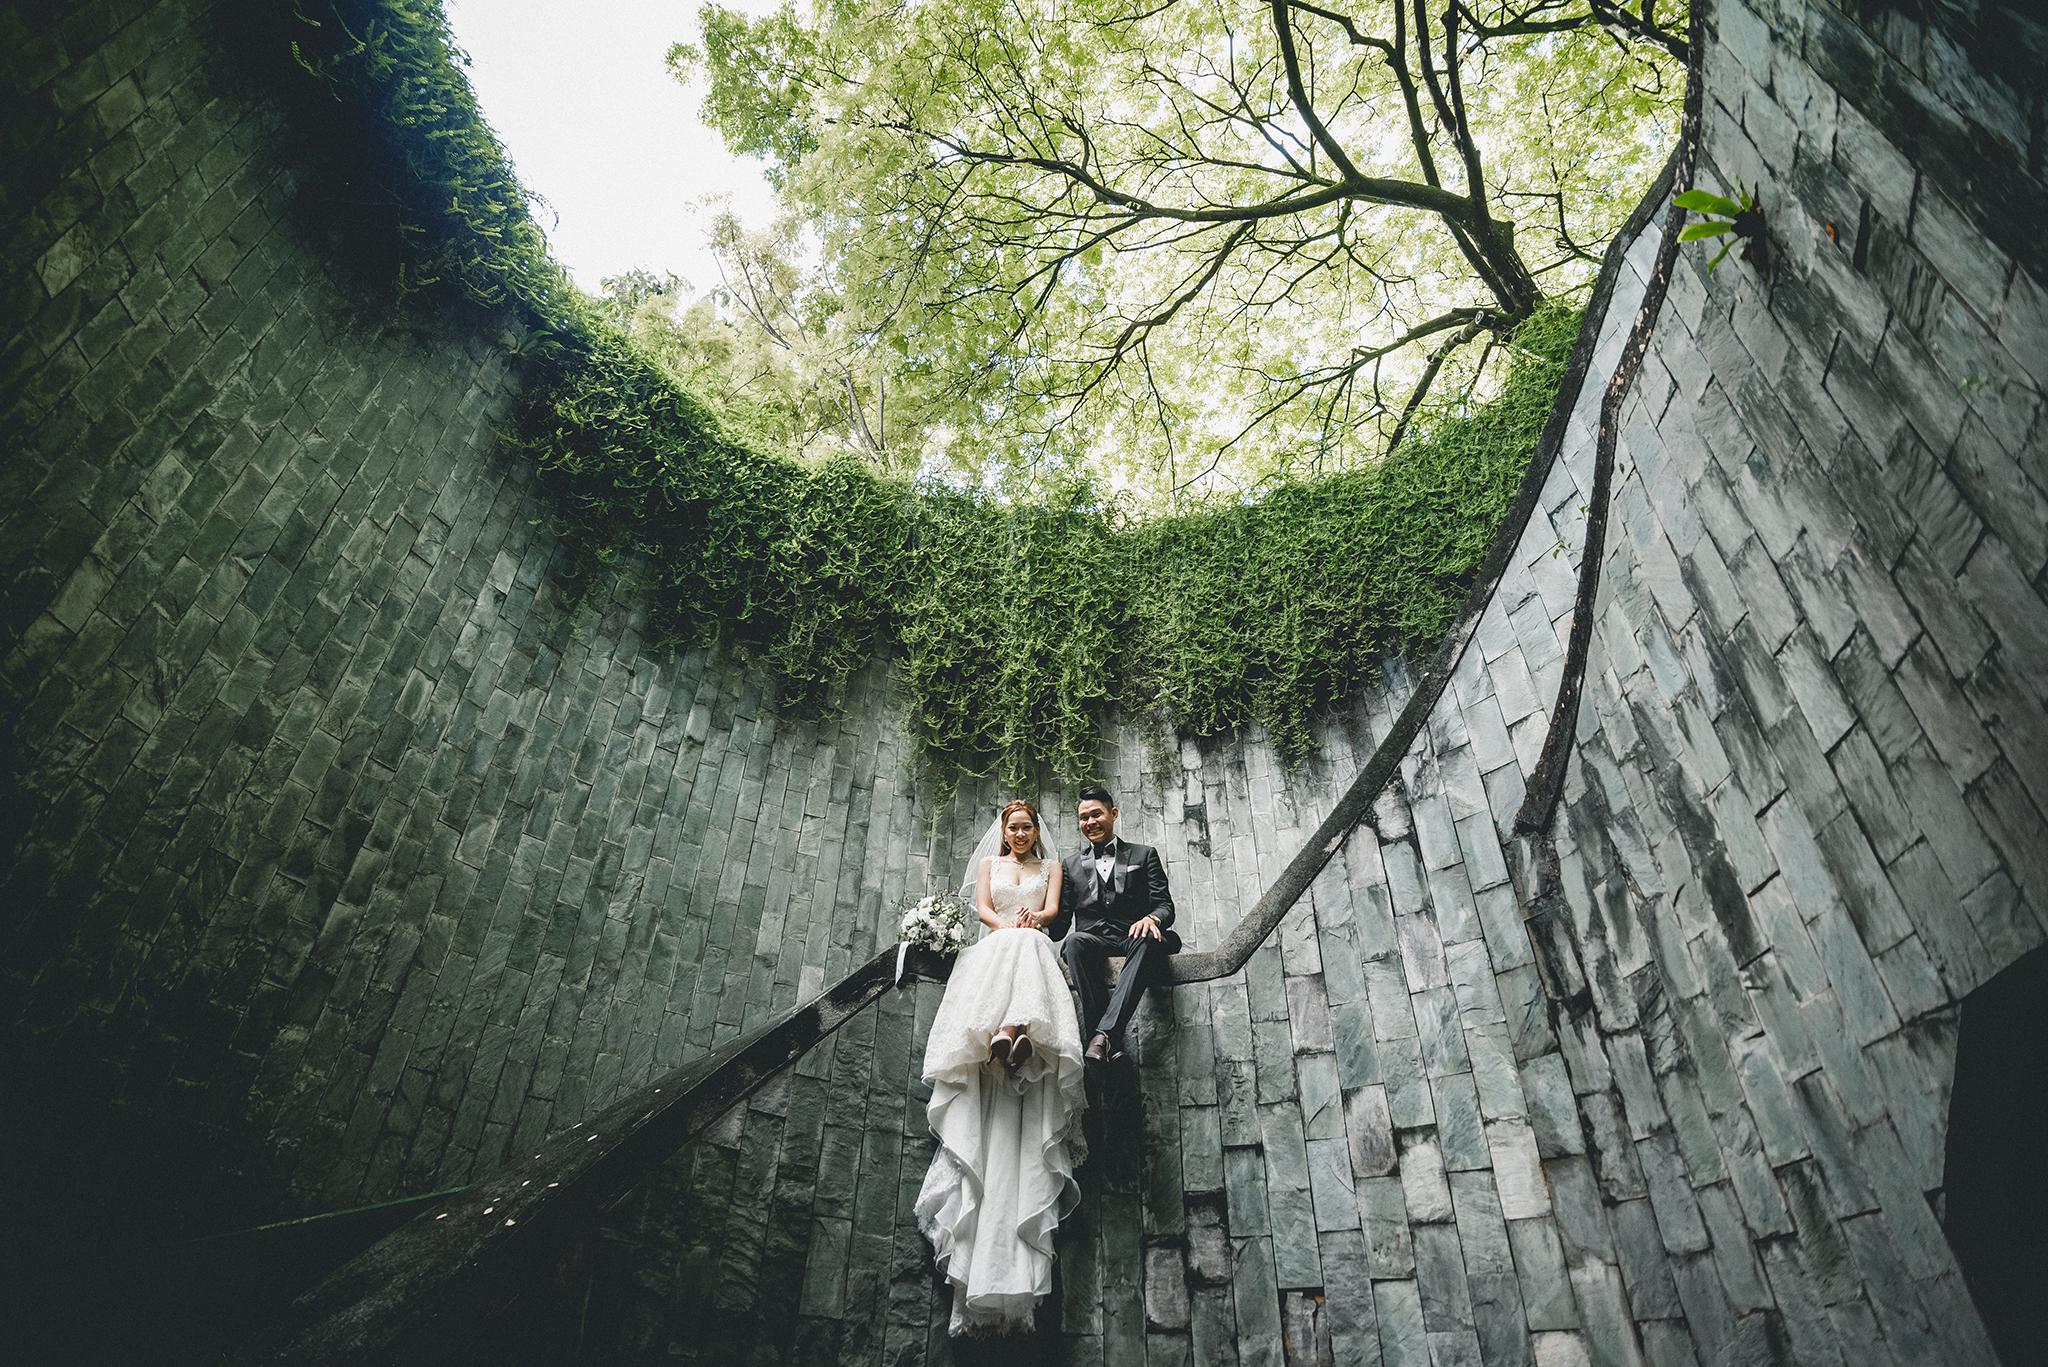 2 Pre wedding fort canning 00003.JPG